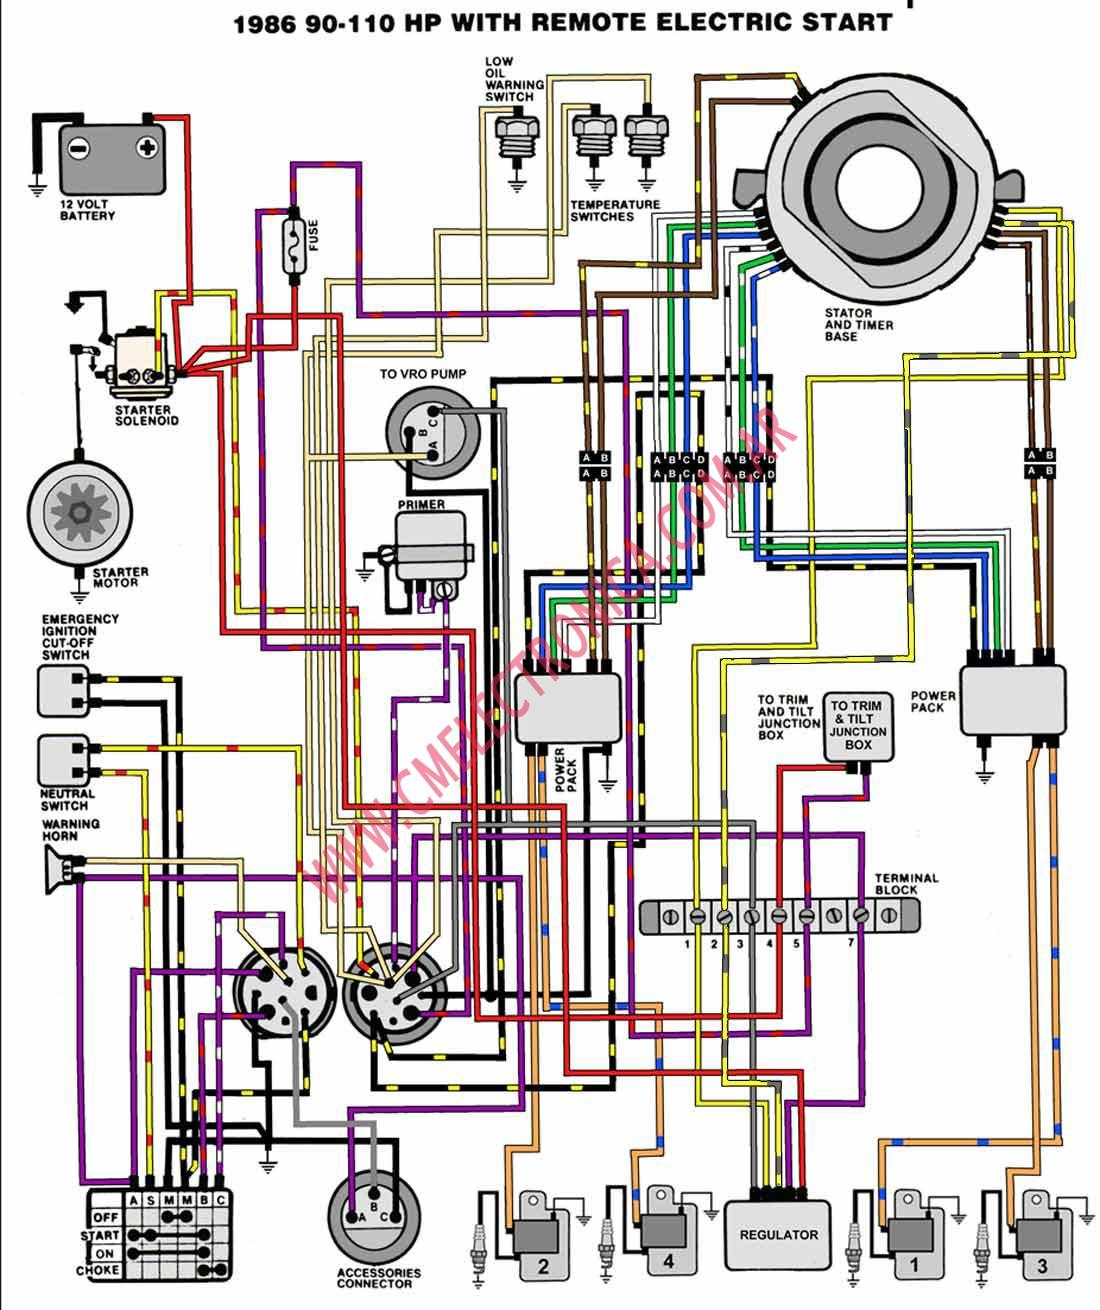 Kymco Super 8 Wiring Diagram Motorrad Bild Idee 2008 100 50cc Shop Manual 2014 Genuine